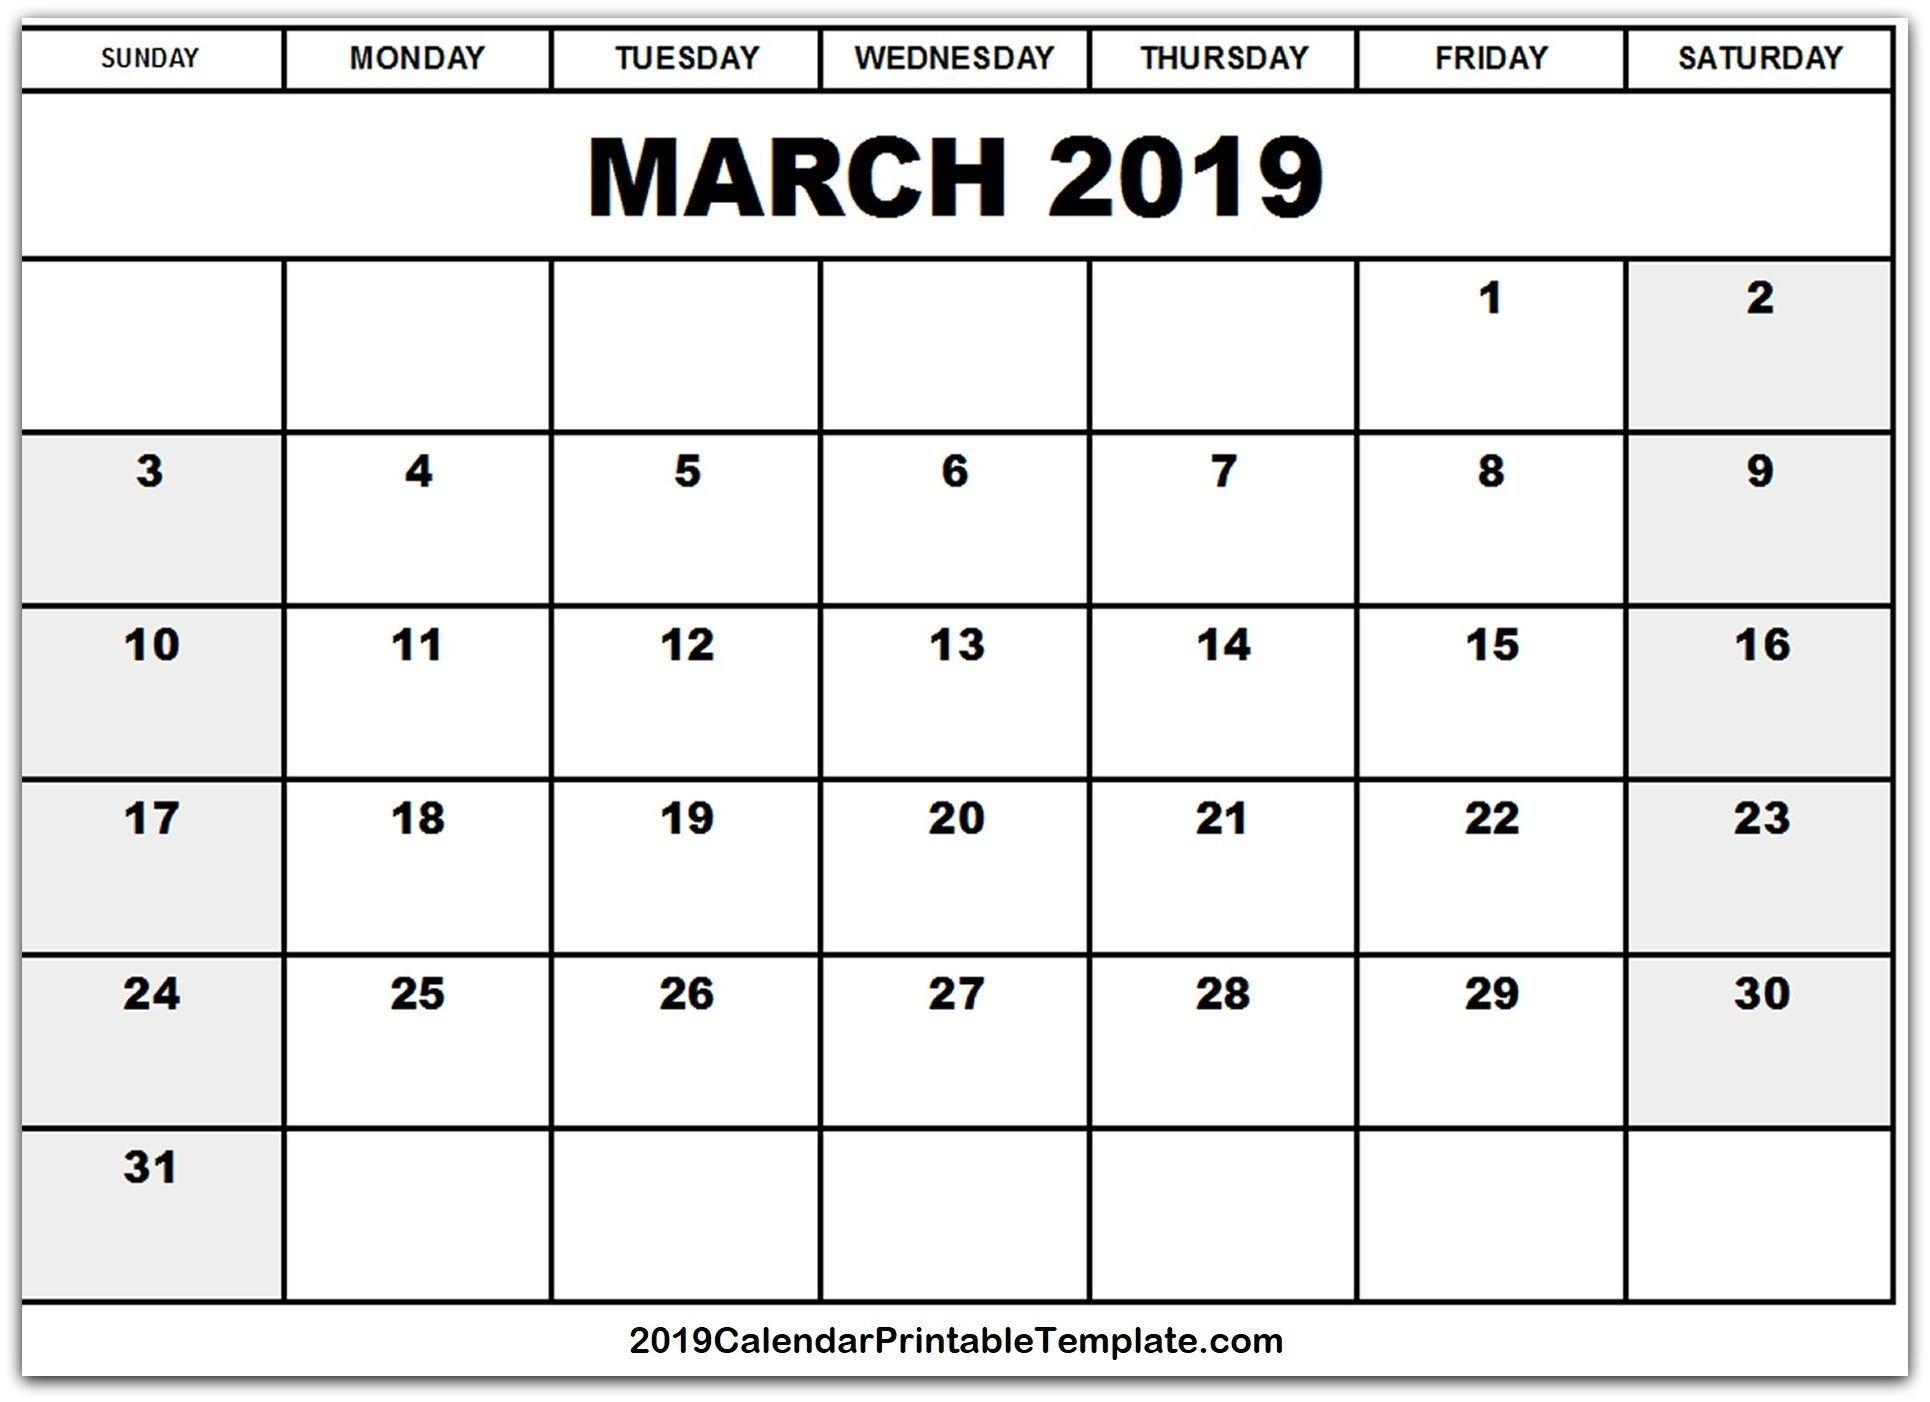 March 2019 Calendar Excel | March 2019 Calendar Printable Templates Calendar 2019 Excel South Africa